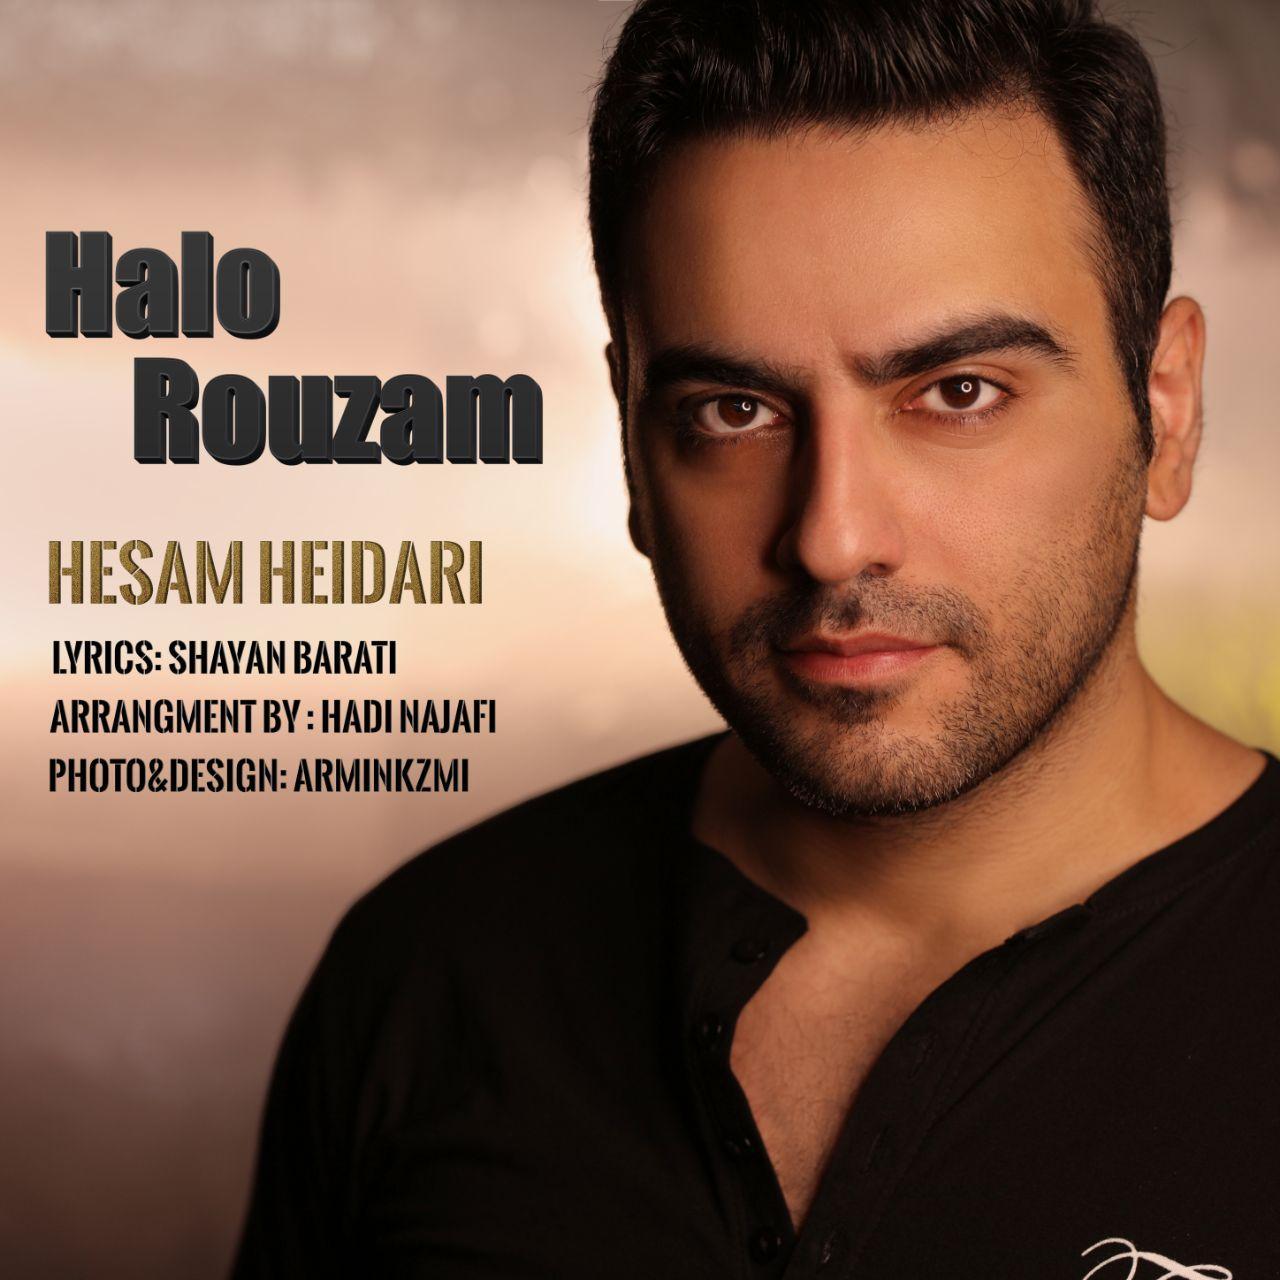 Hesam Heidari – Halo Rouzam